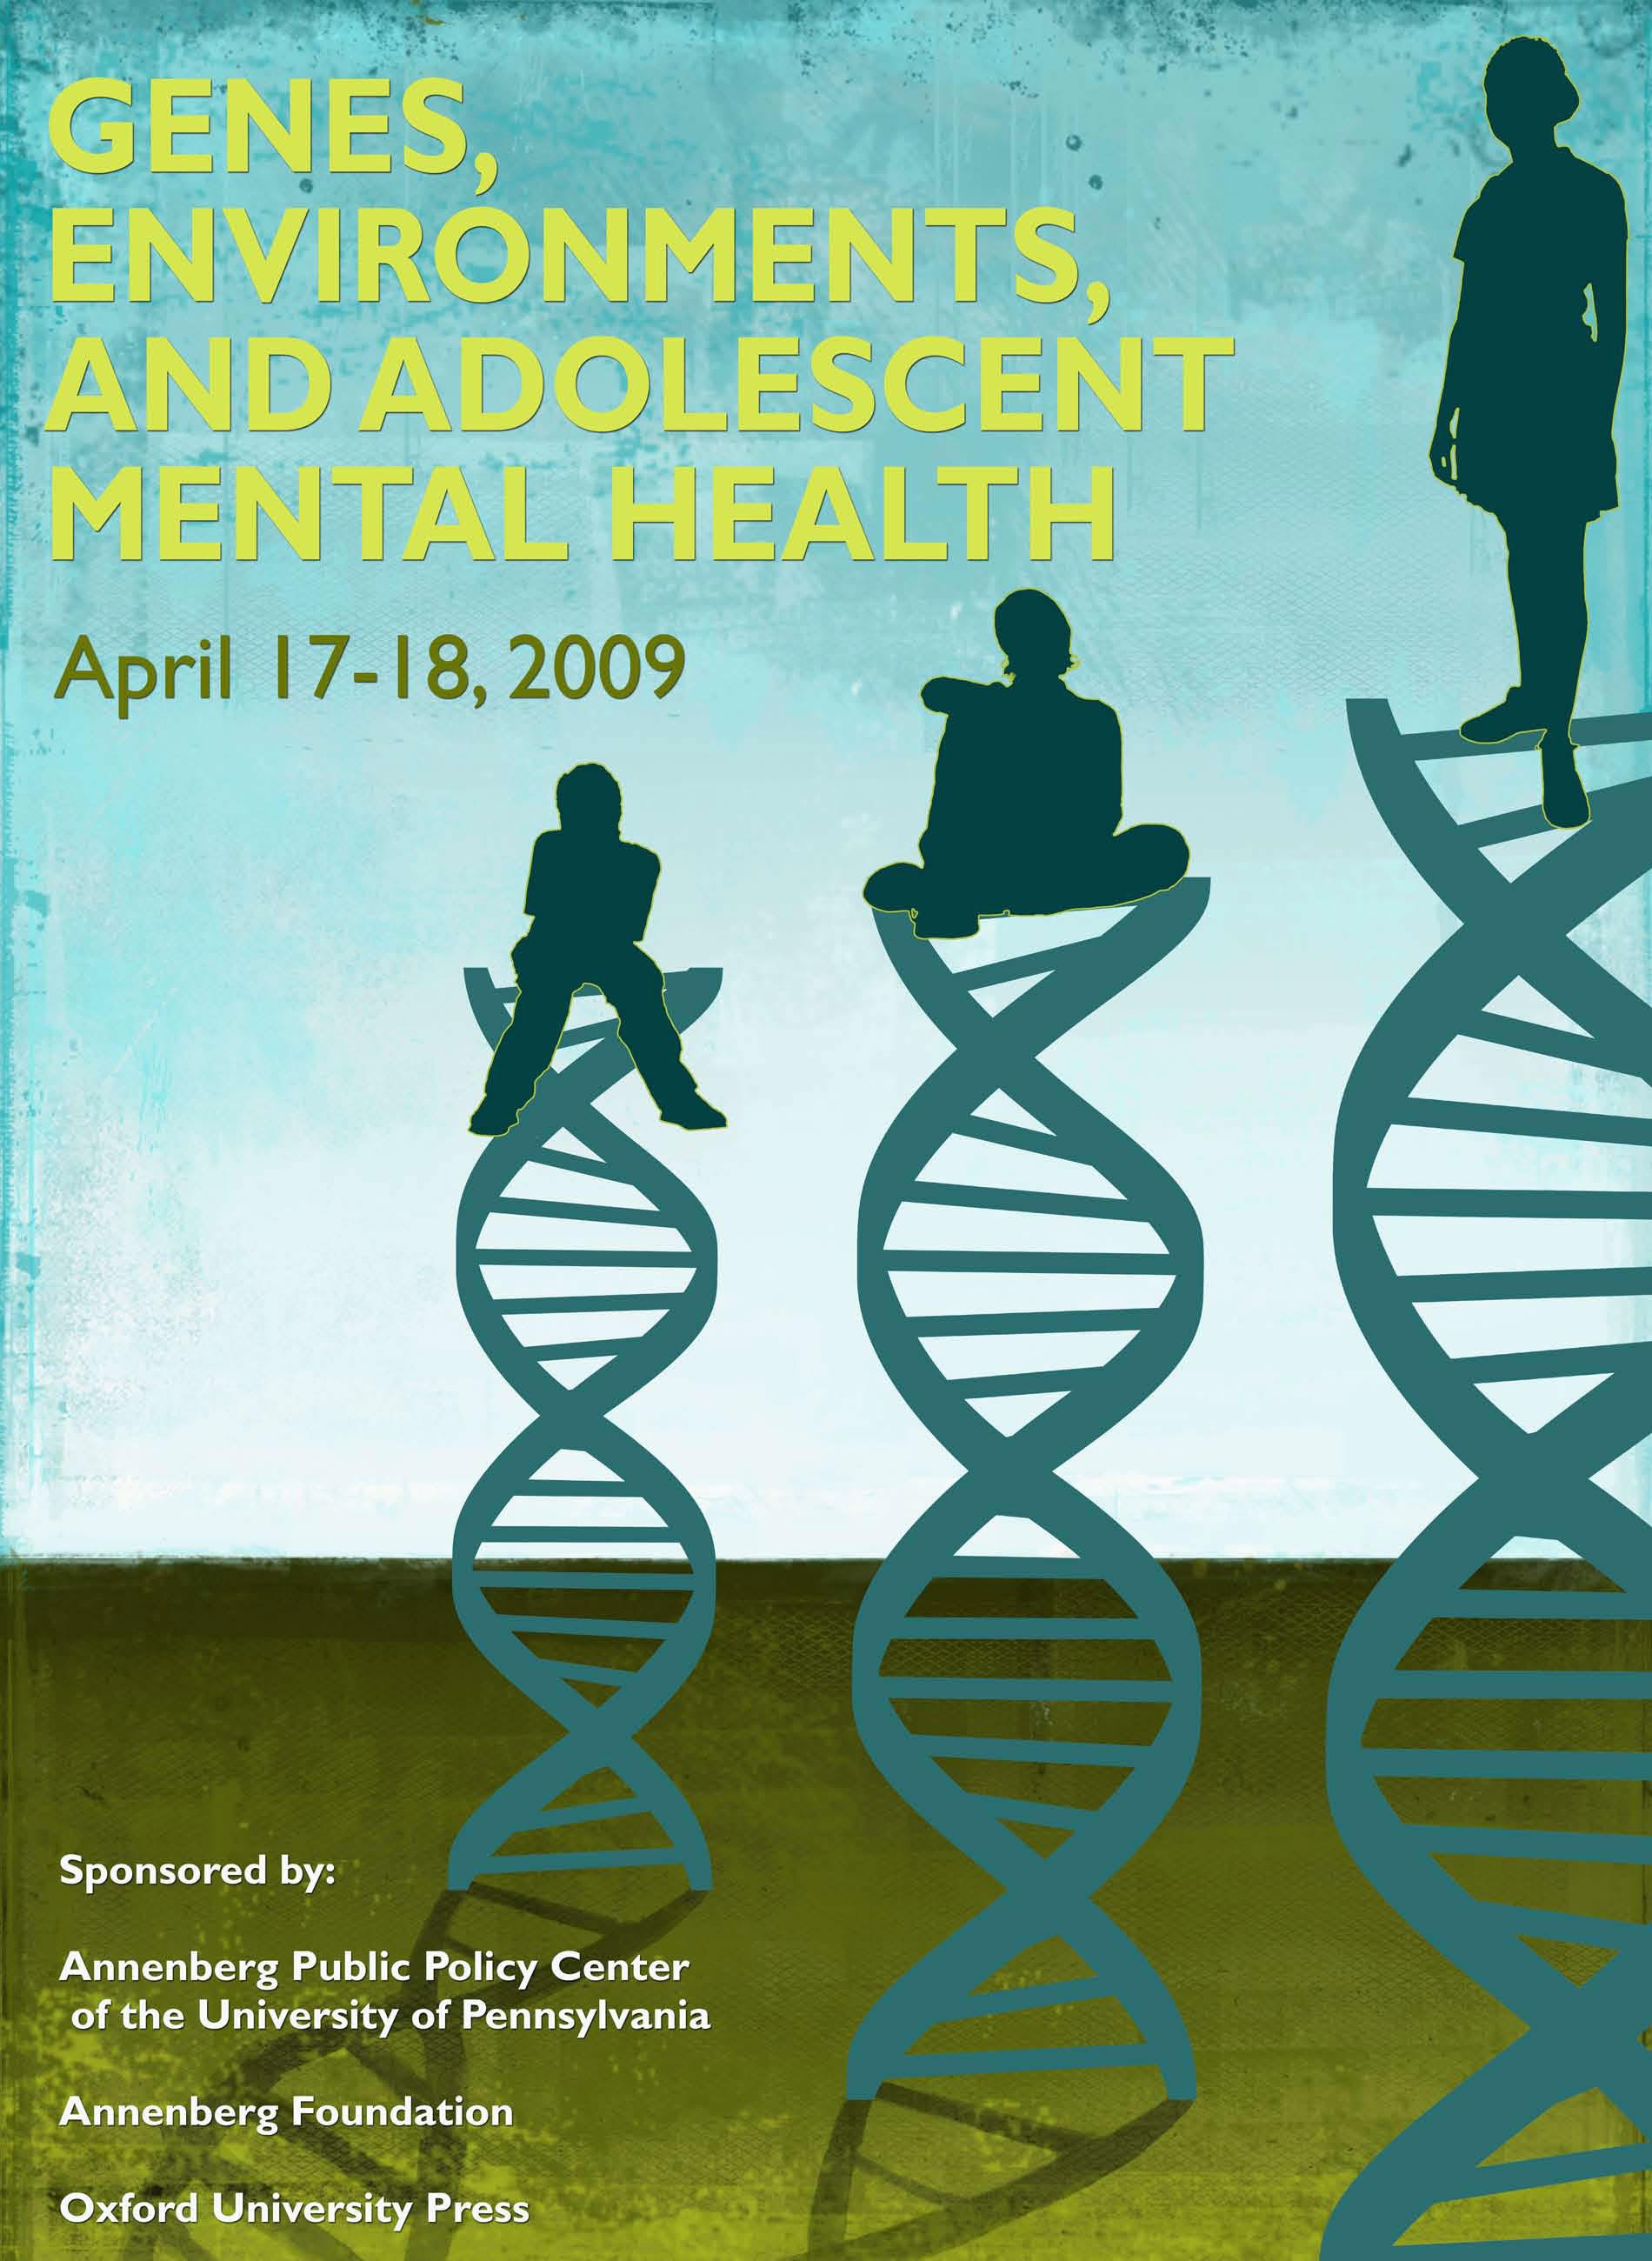 Poster, Annenberg Public Policy Center, University of Pennsylvania